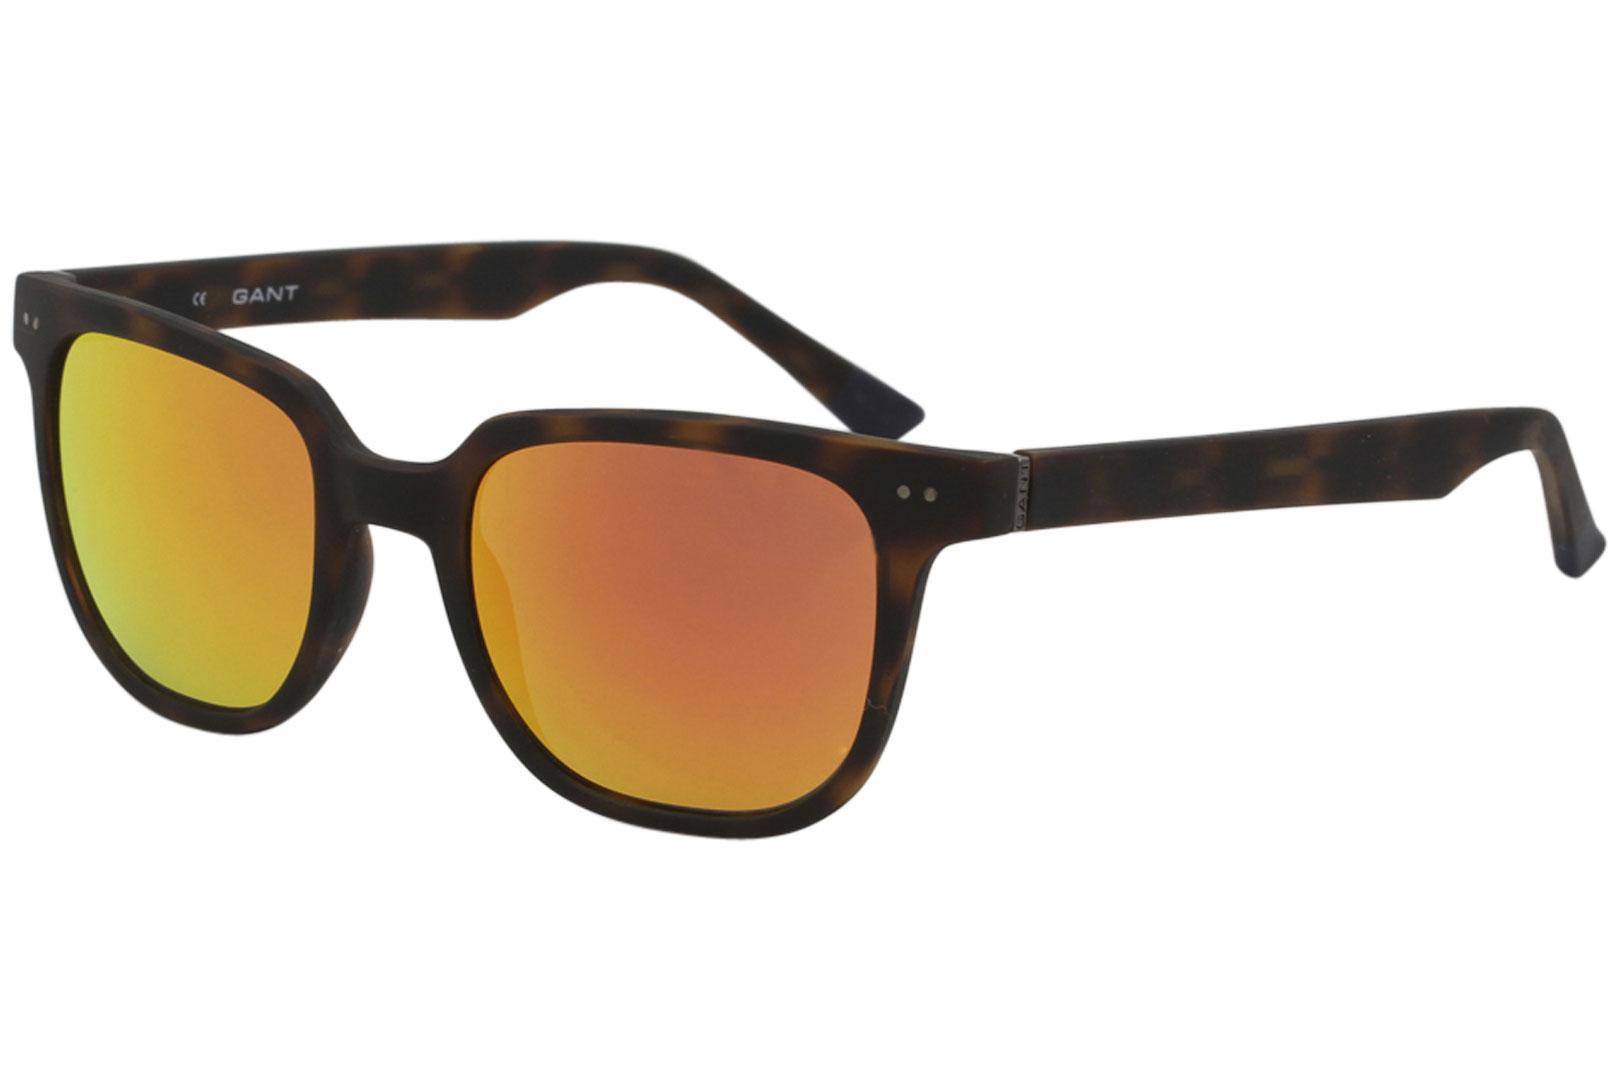 Image of Gant Men's GS7019 GS/7019 Fashion Square Sunglasses - Matte Tortoise/Blue Orange Mirror   MTO/15F - Lens 52 Bridge 20 Temple 145mm